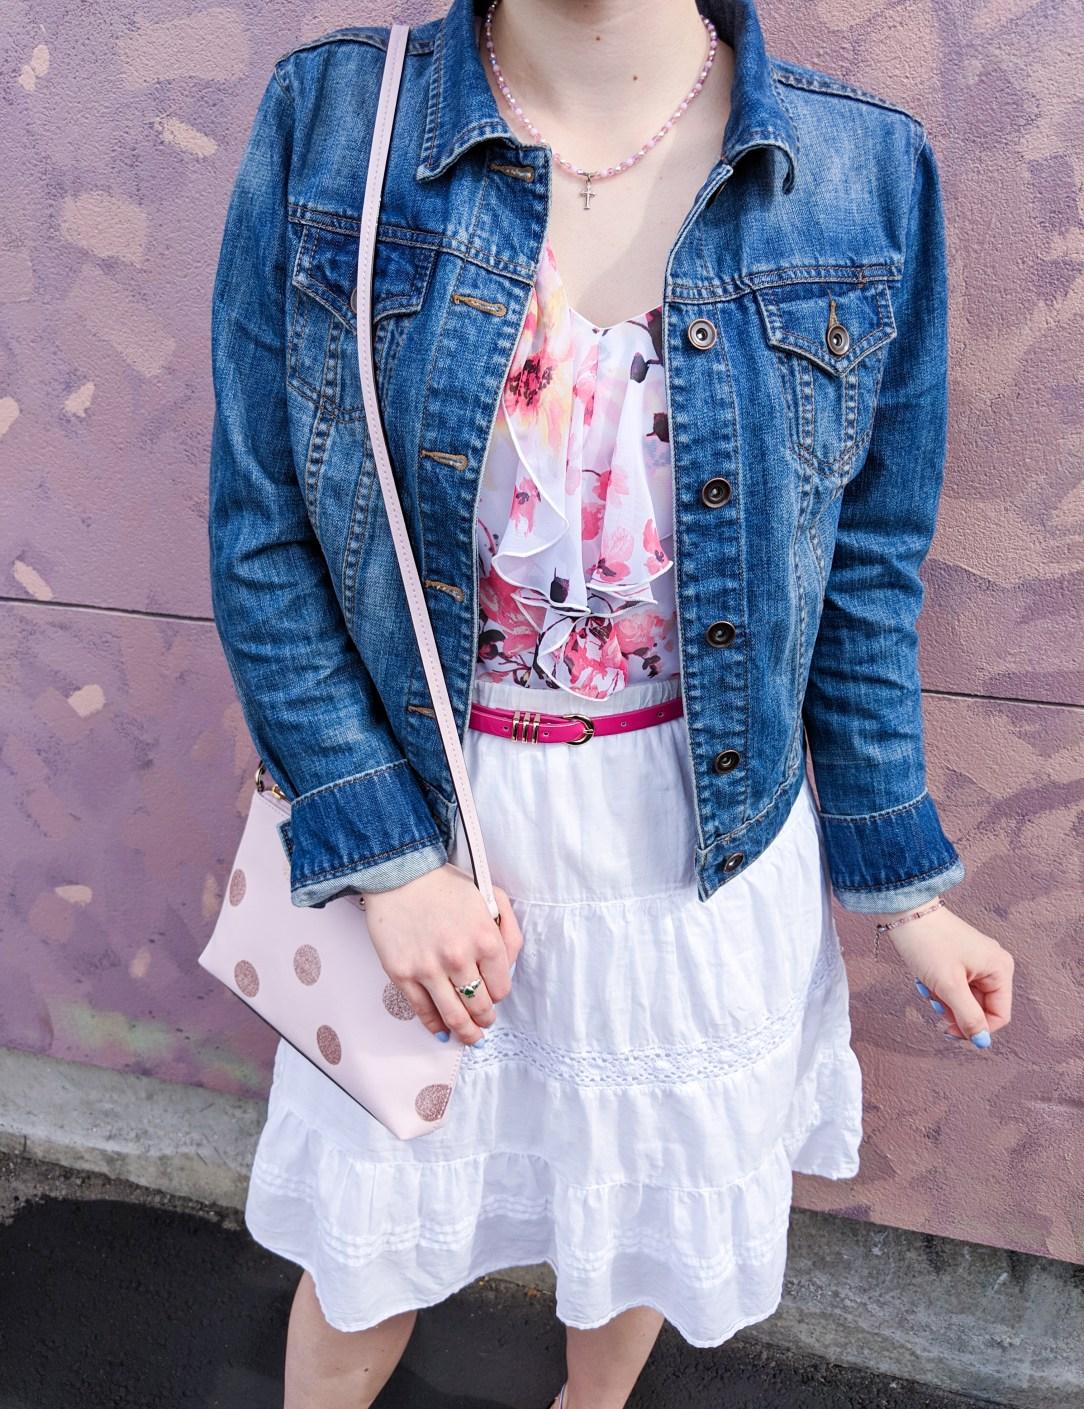 jean jacket, floral blouse, pink polka dot purse